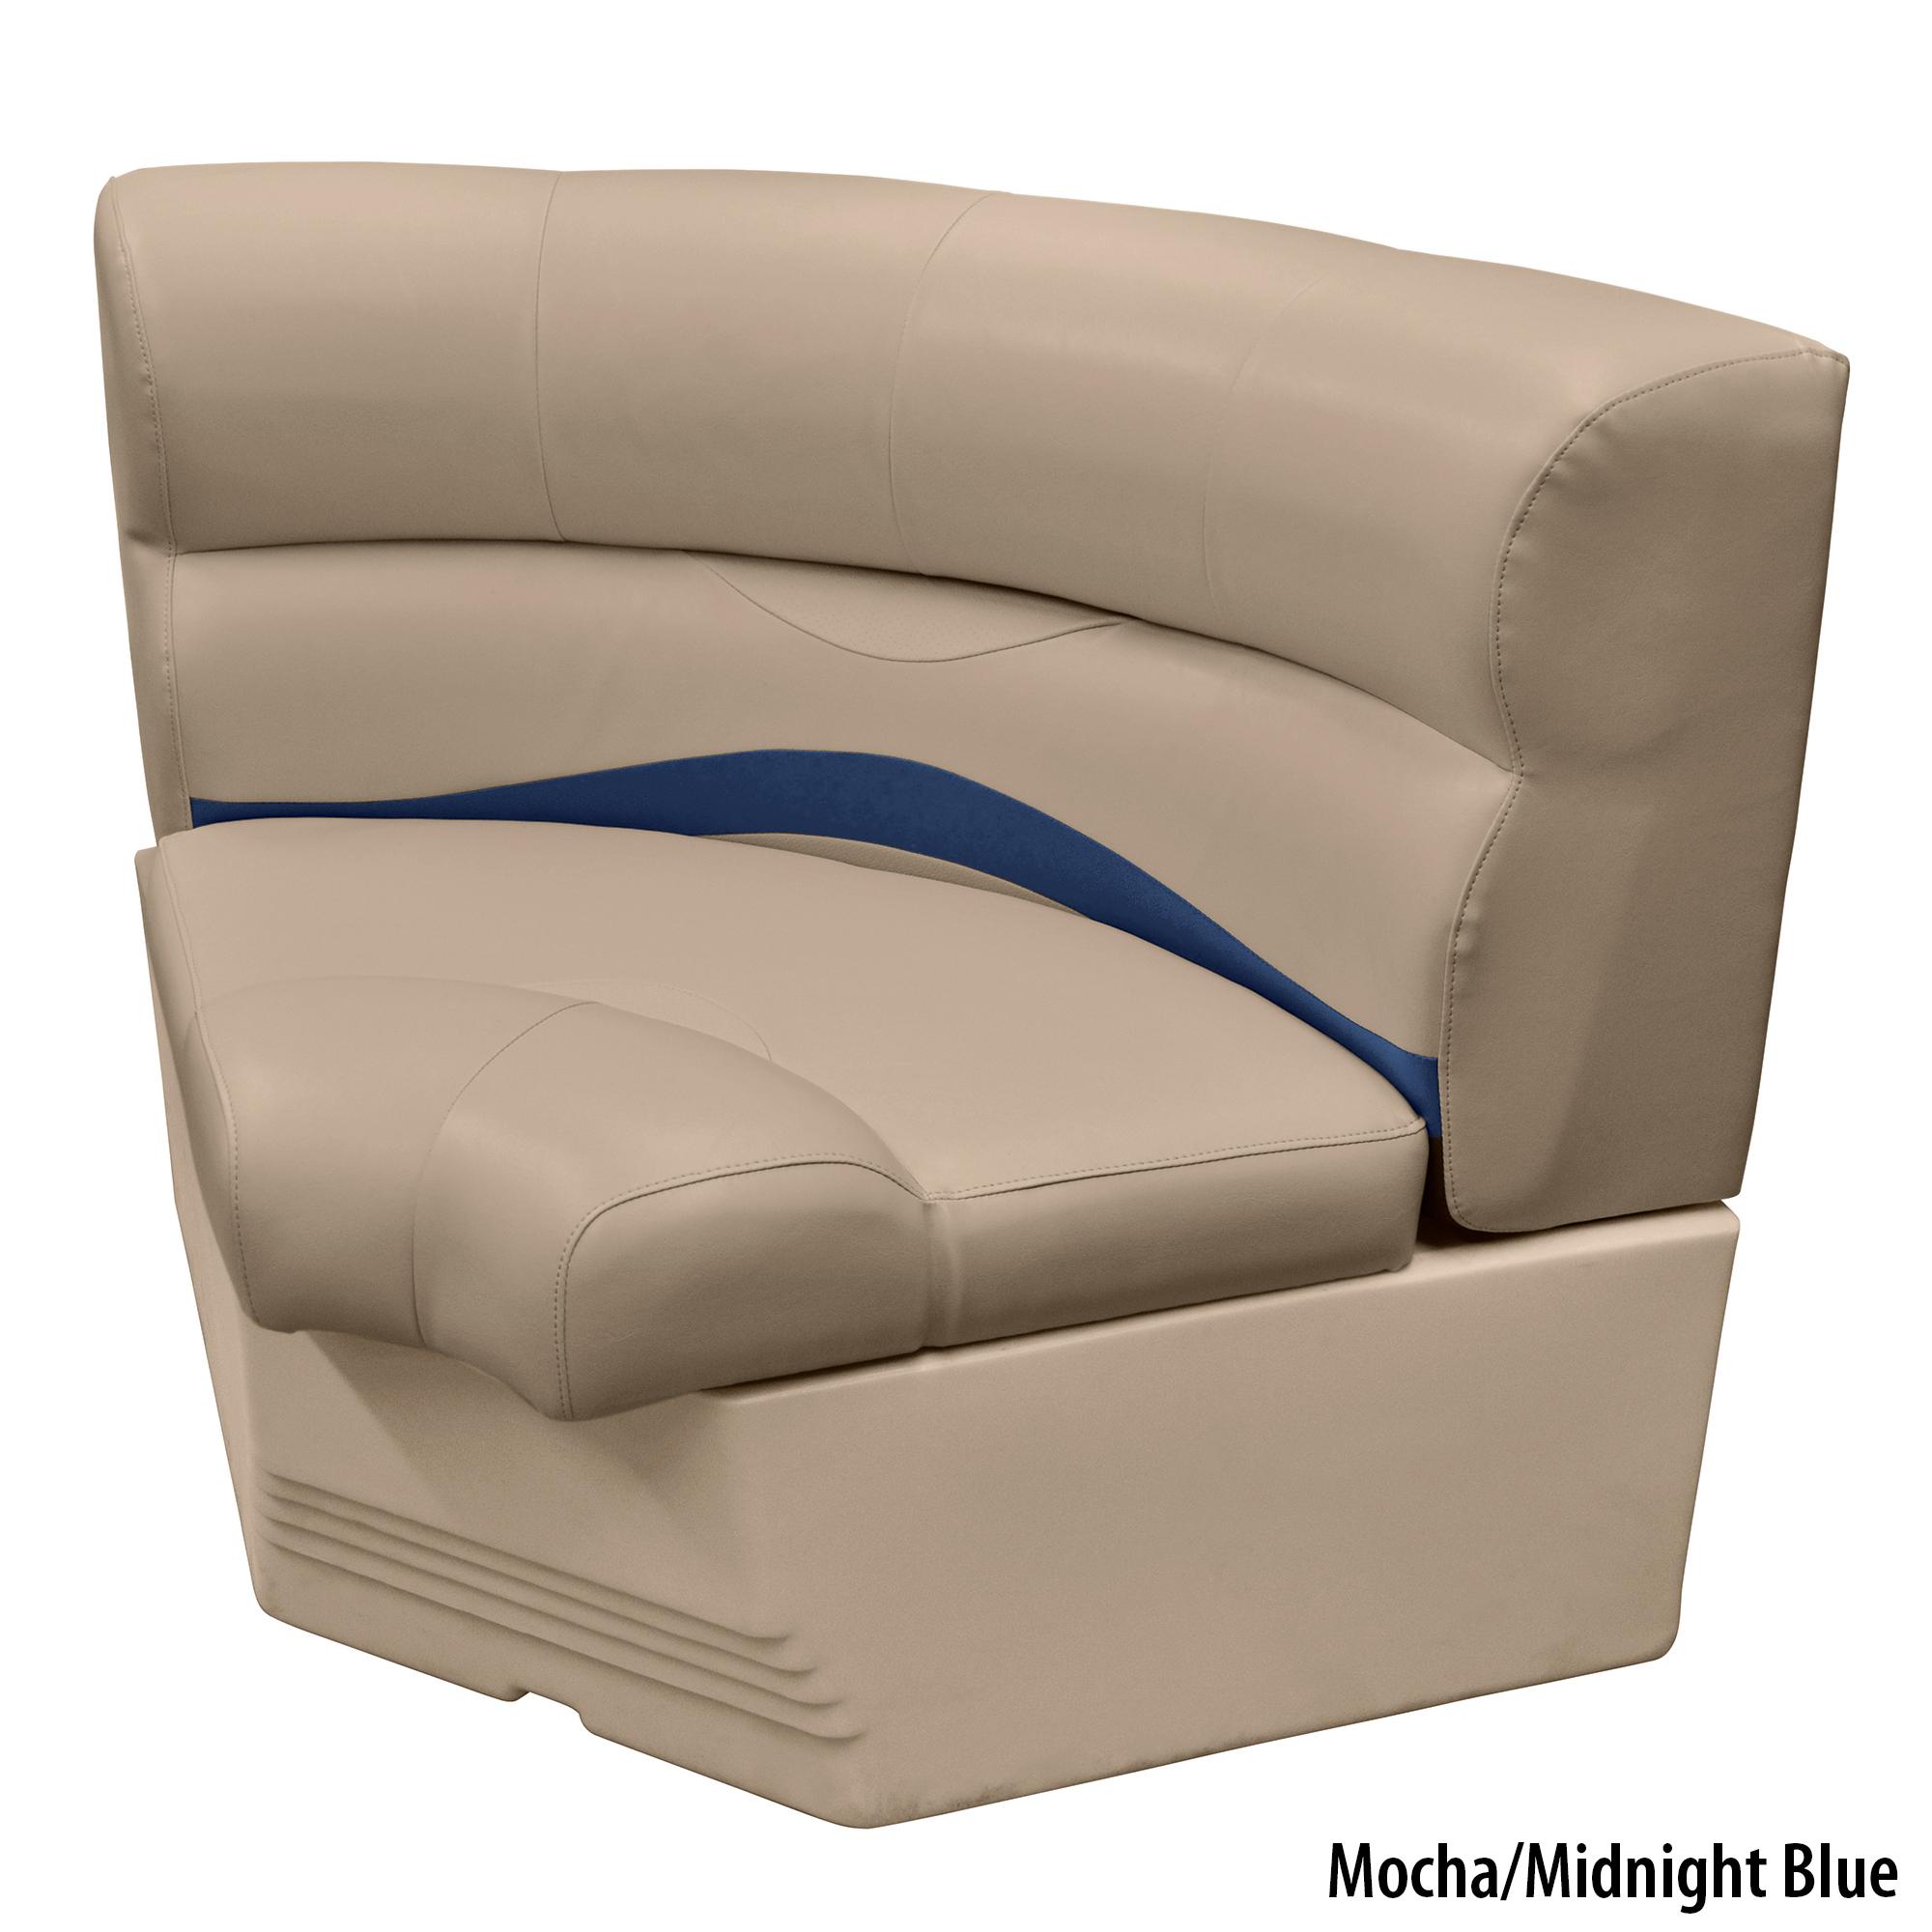 "Toonmate 32"" Premium Pontoon Corner Section Seat w/Bow Radius Corner, Mocha Base"